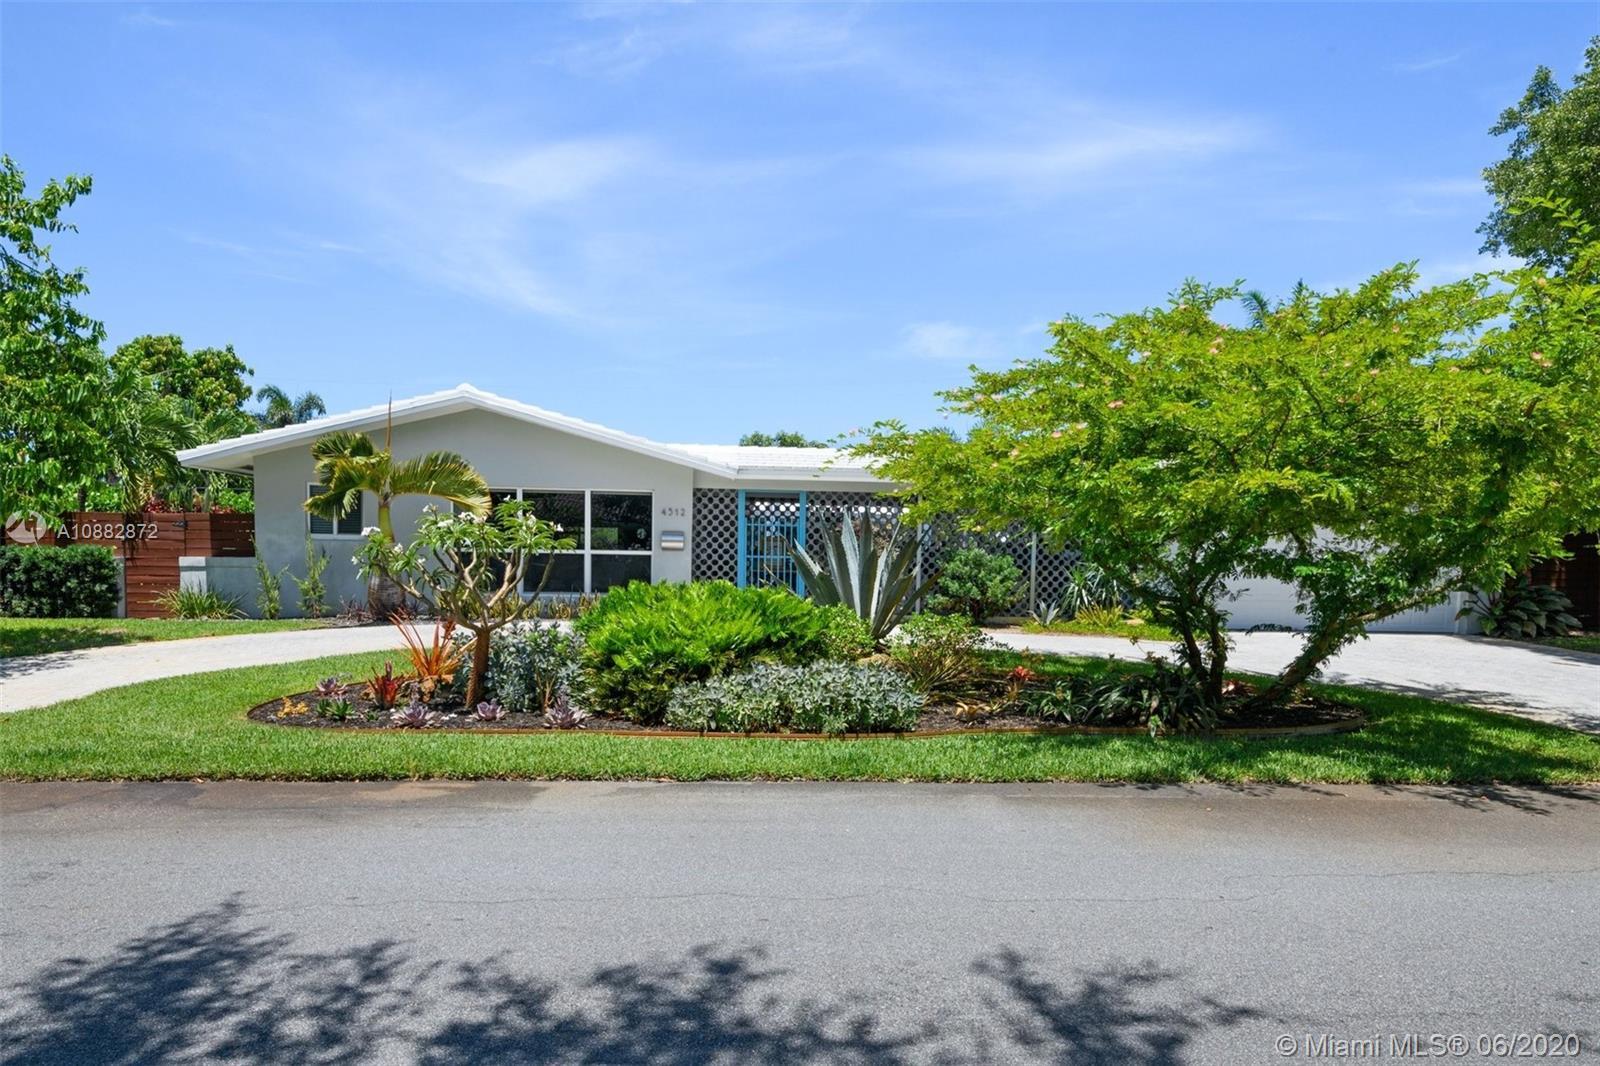 Coral Ridge Country Club # - 01 - photo